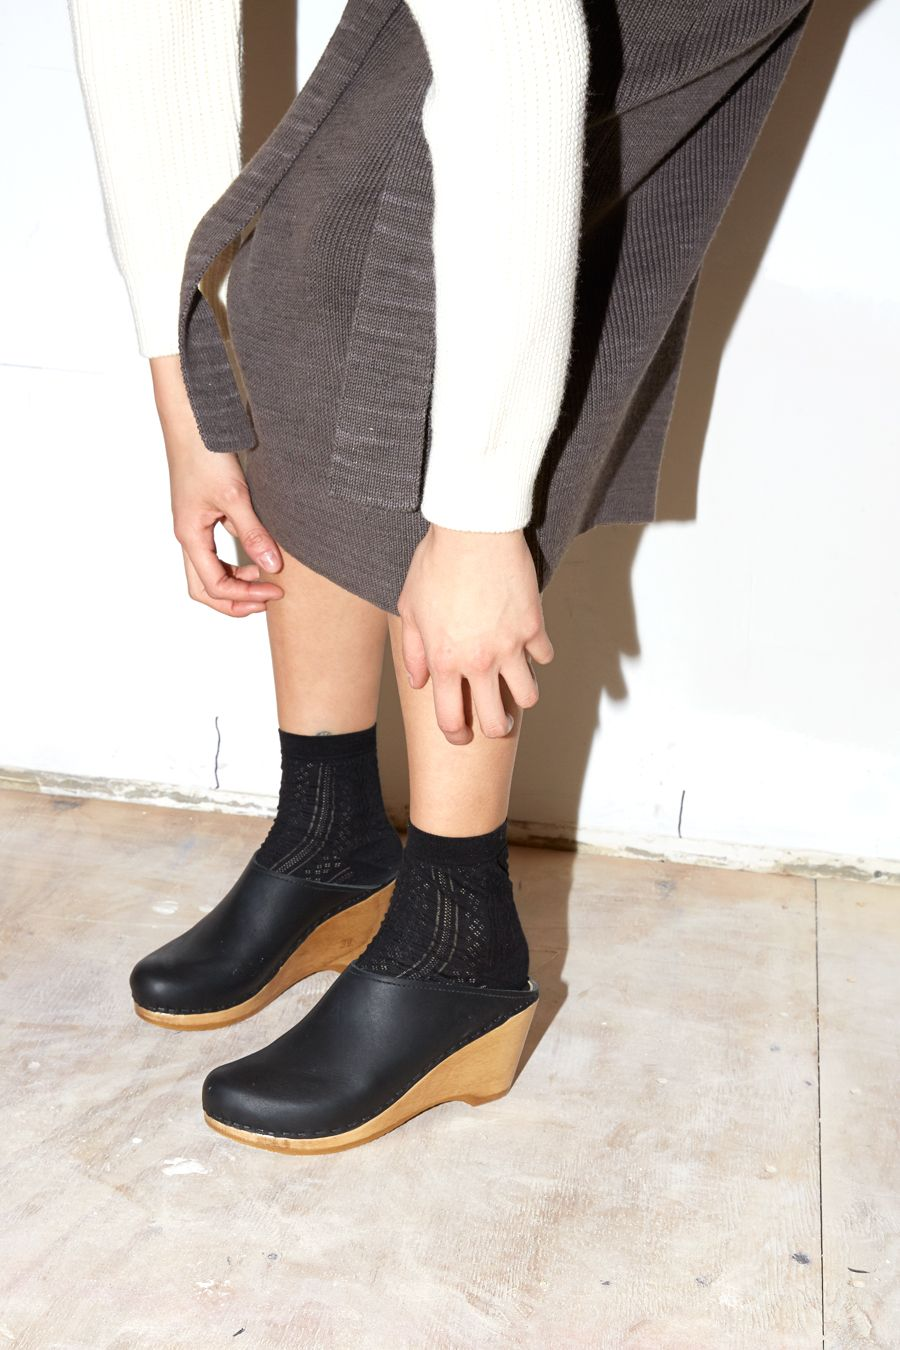 No.6 New School Clog in Black | Socks